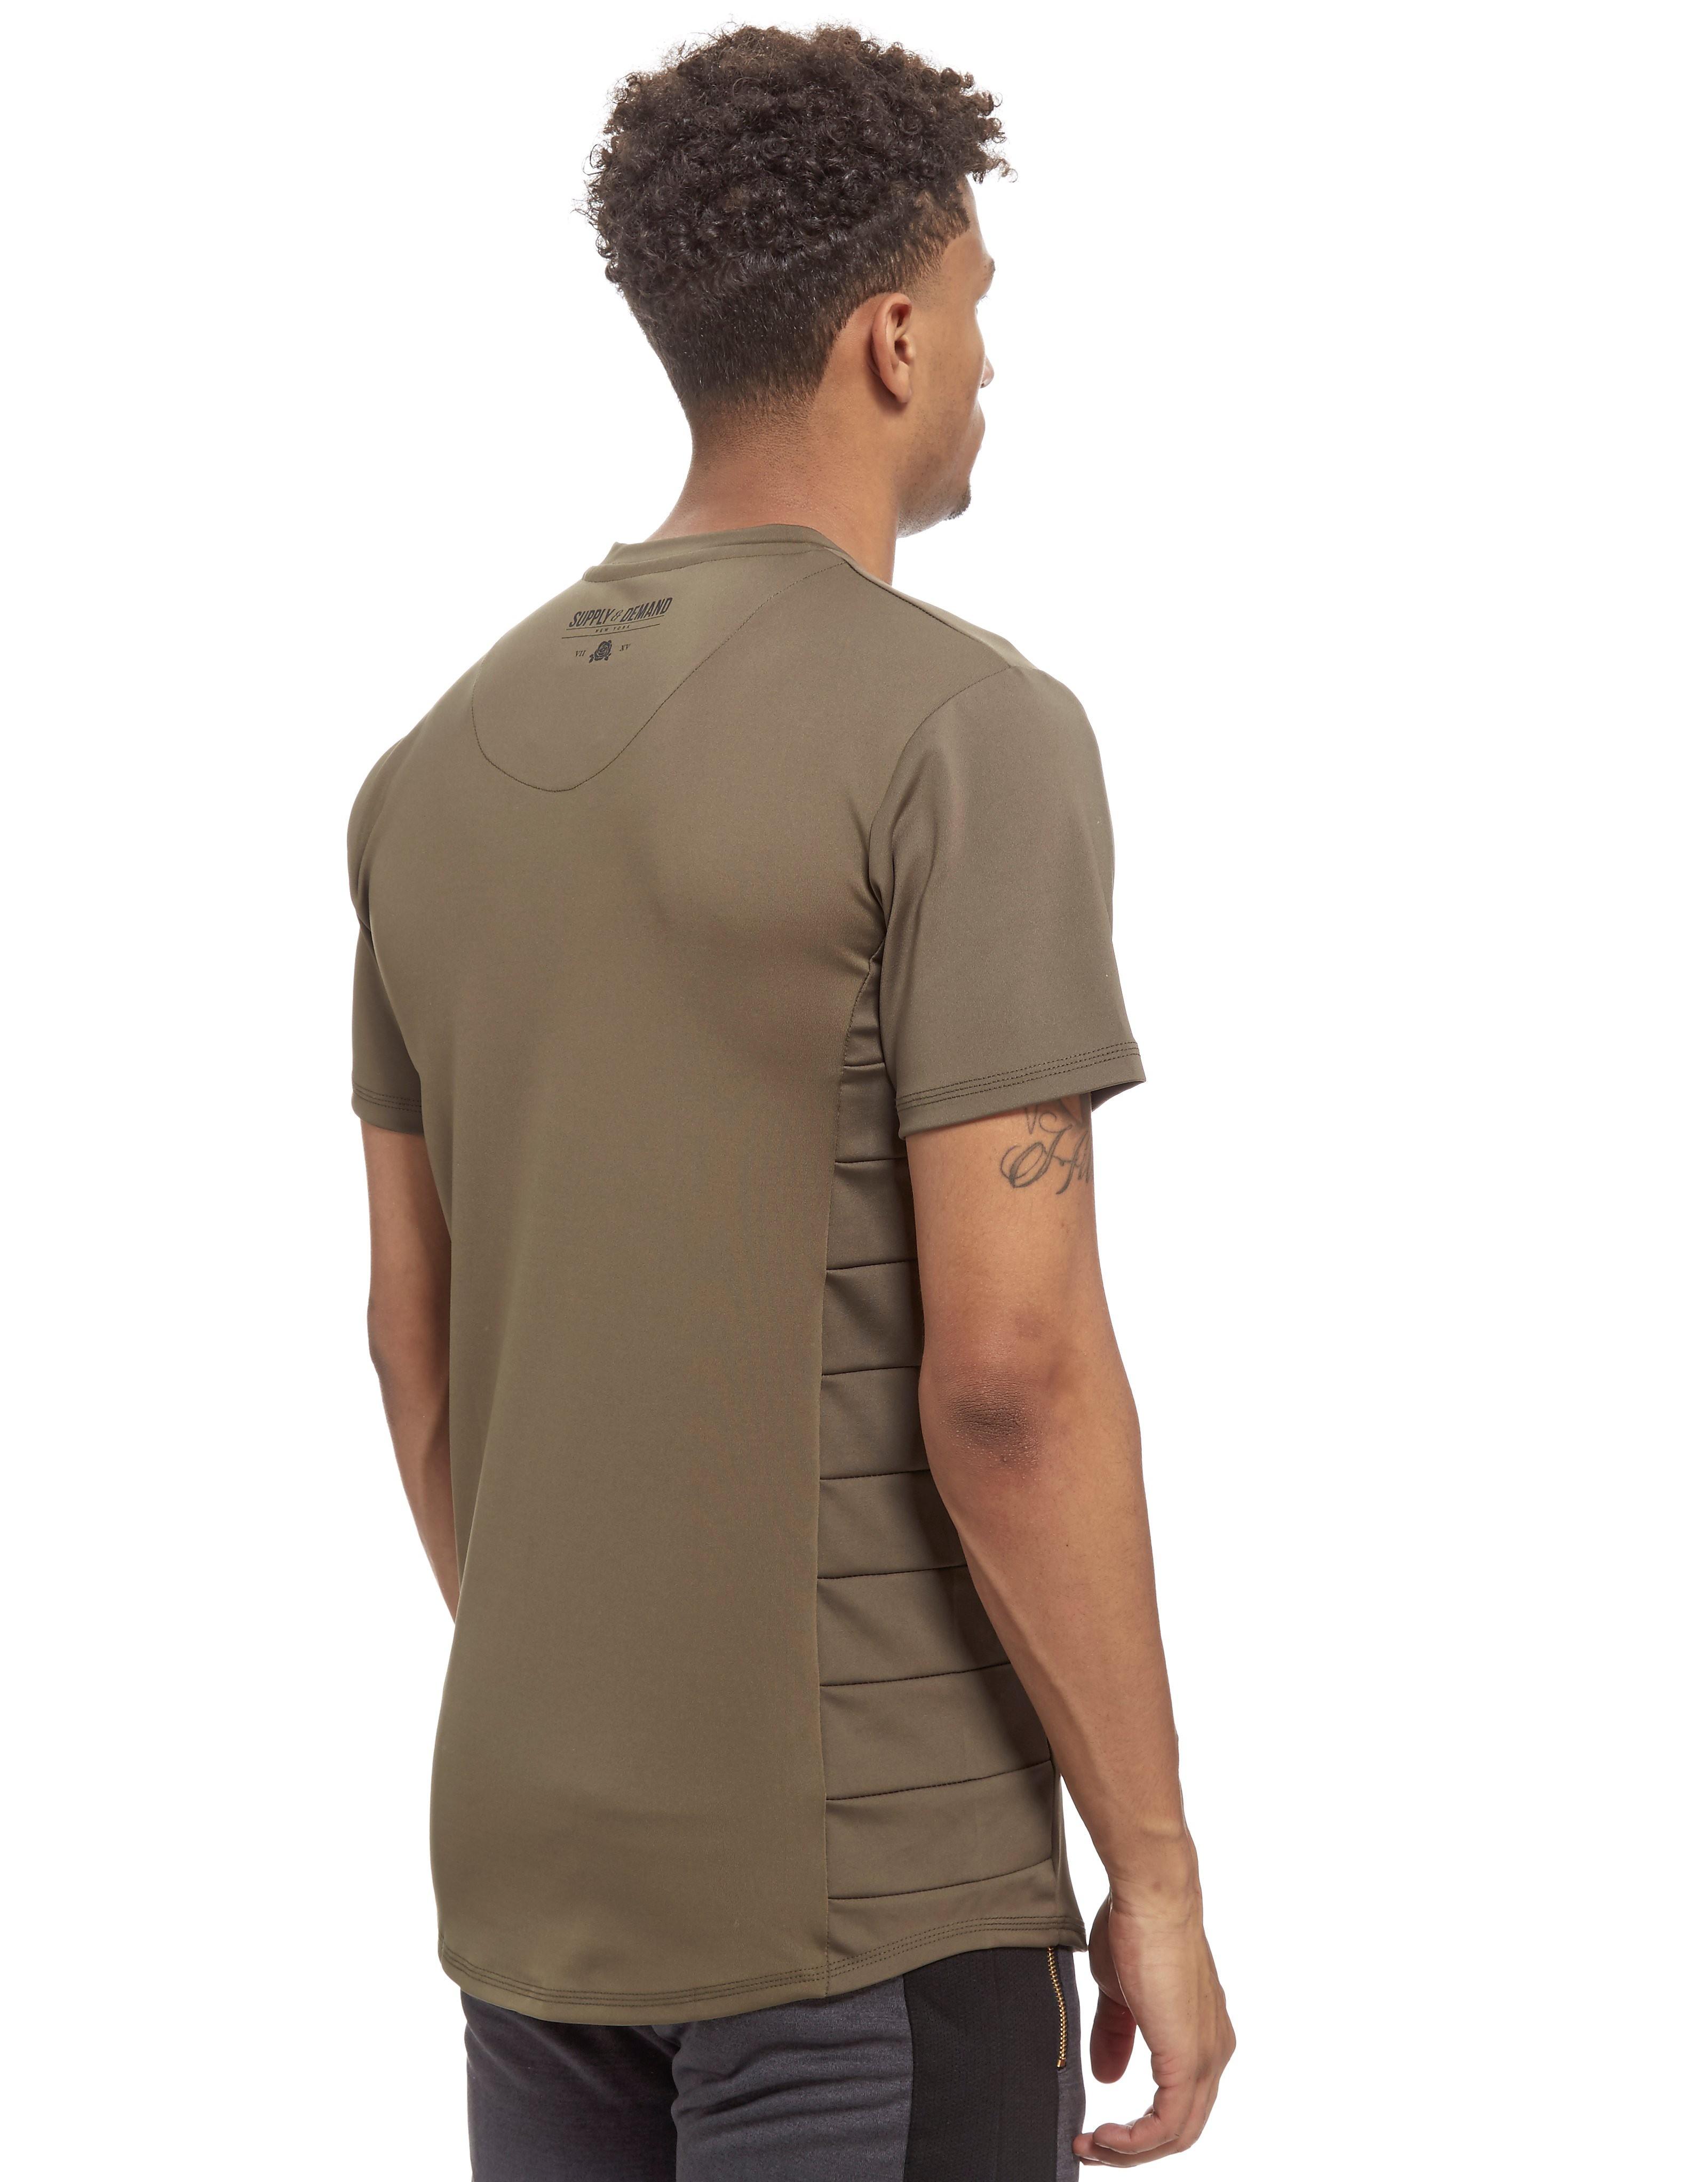 Supply & Demand Gothic Snake T-Shirt